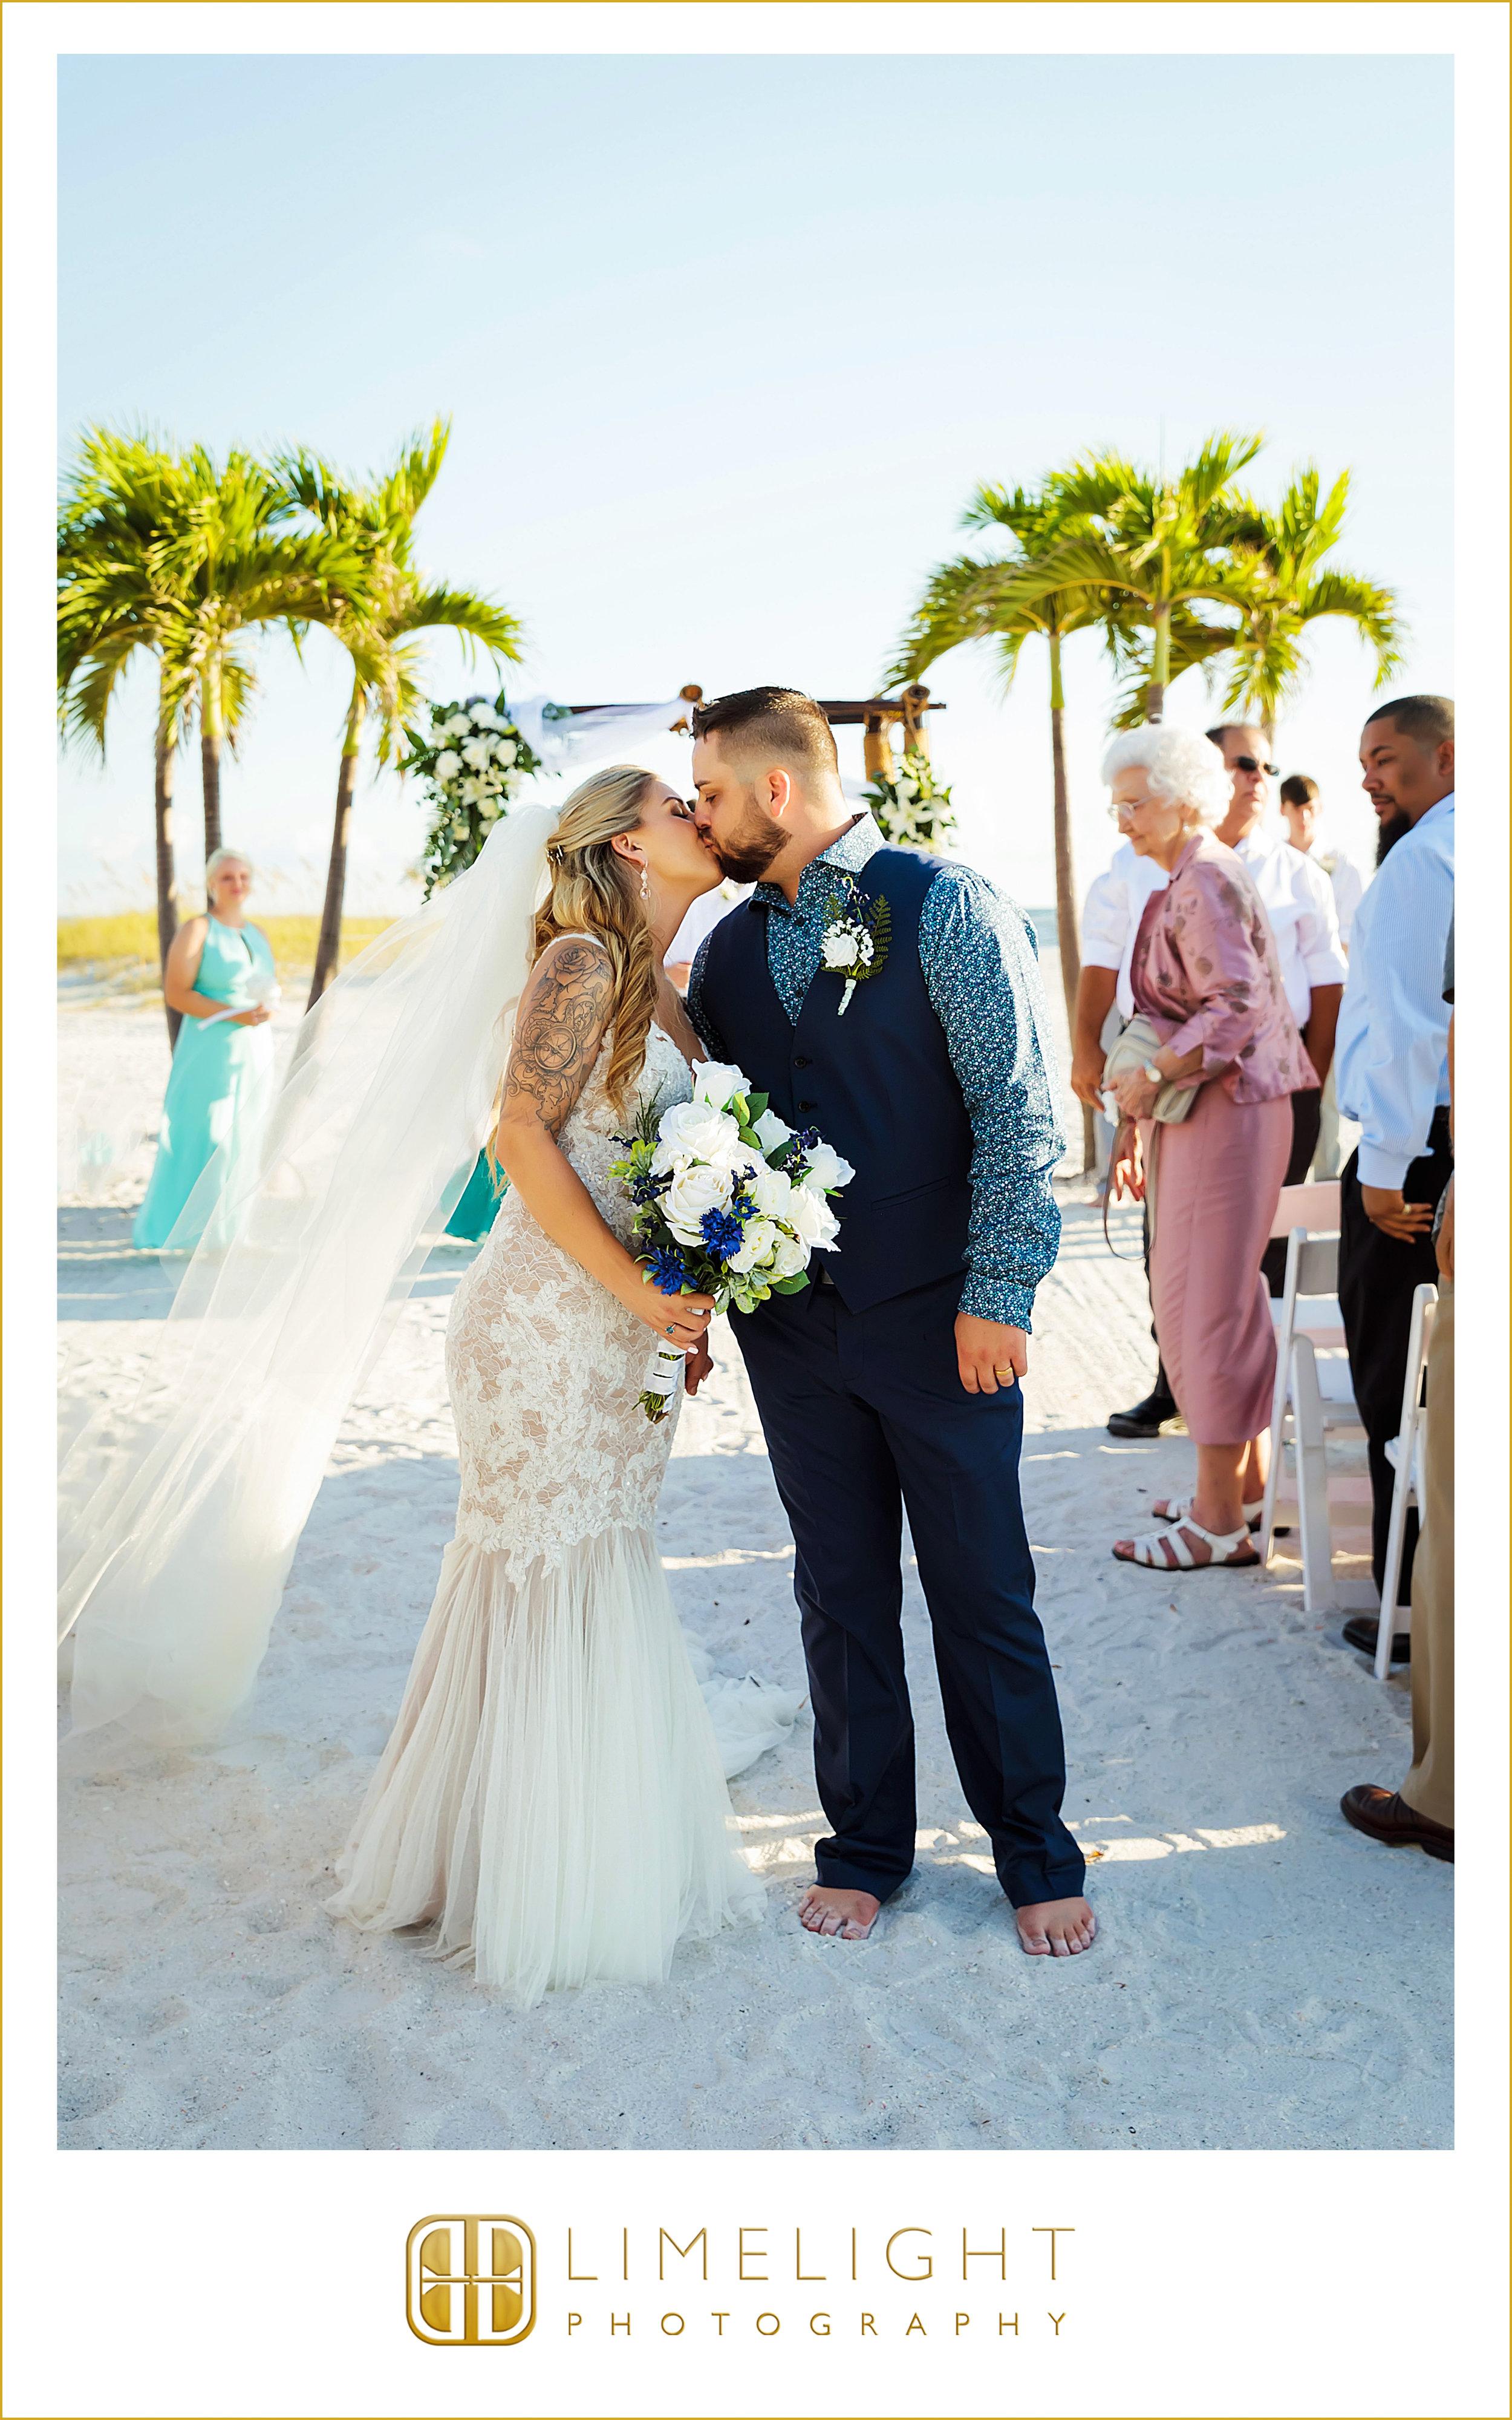 Mr. & Mrs. | Portraits | Wedding